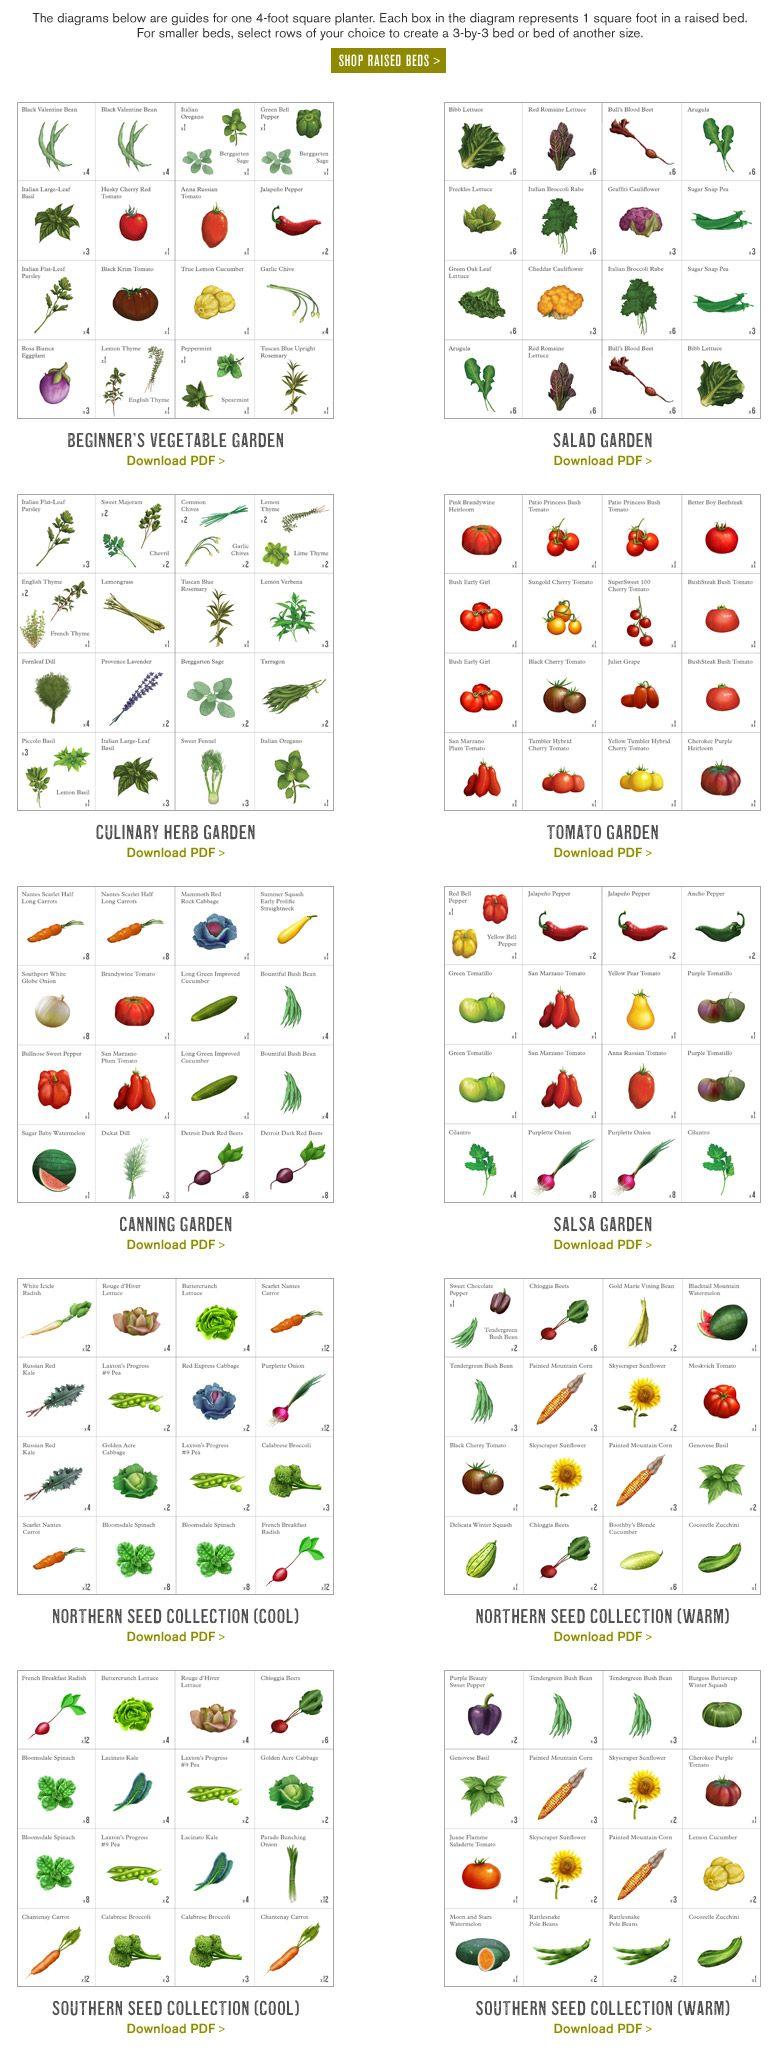 219d52b4cbf9ef91aa83f52d1d25ebbe - Square Foot Gardening Planting Chart Pdf